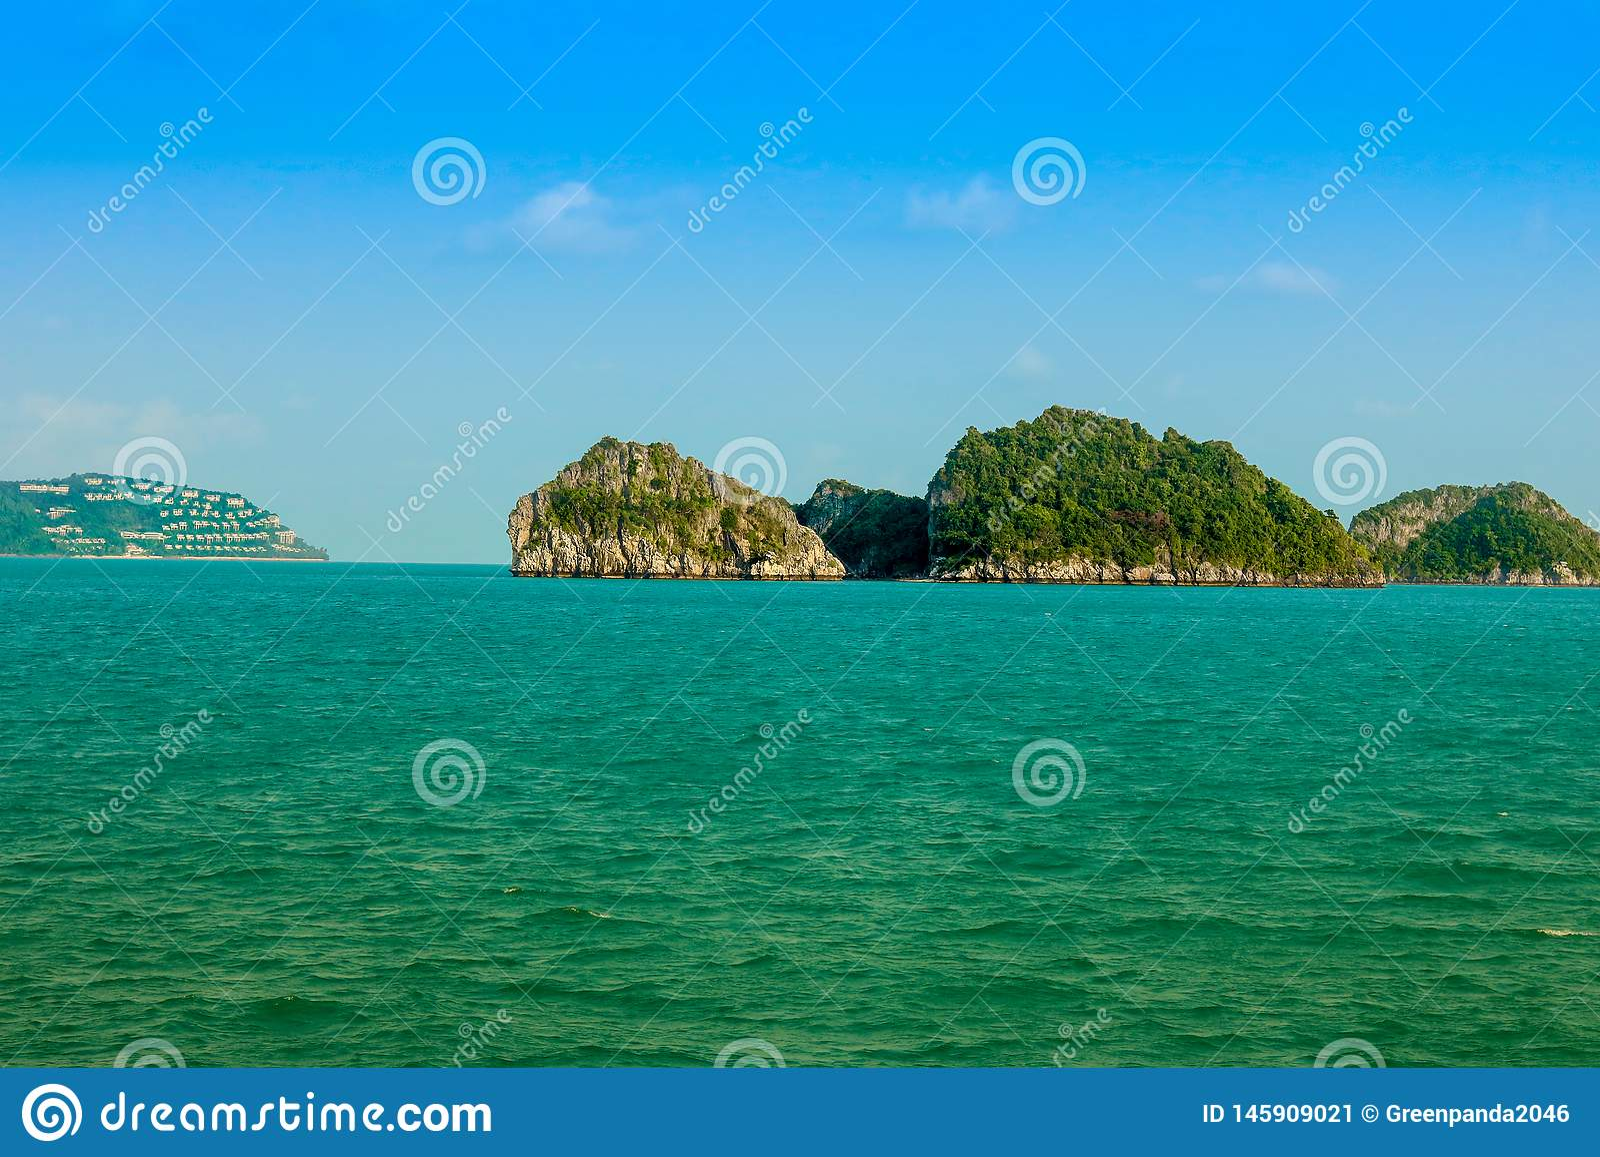 Isola tropicale in Tailandia